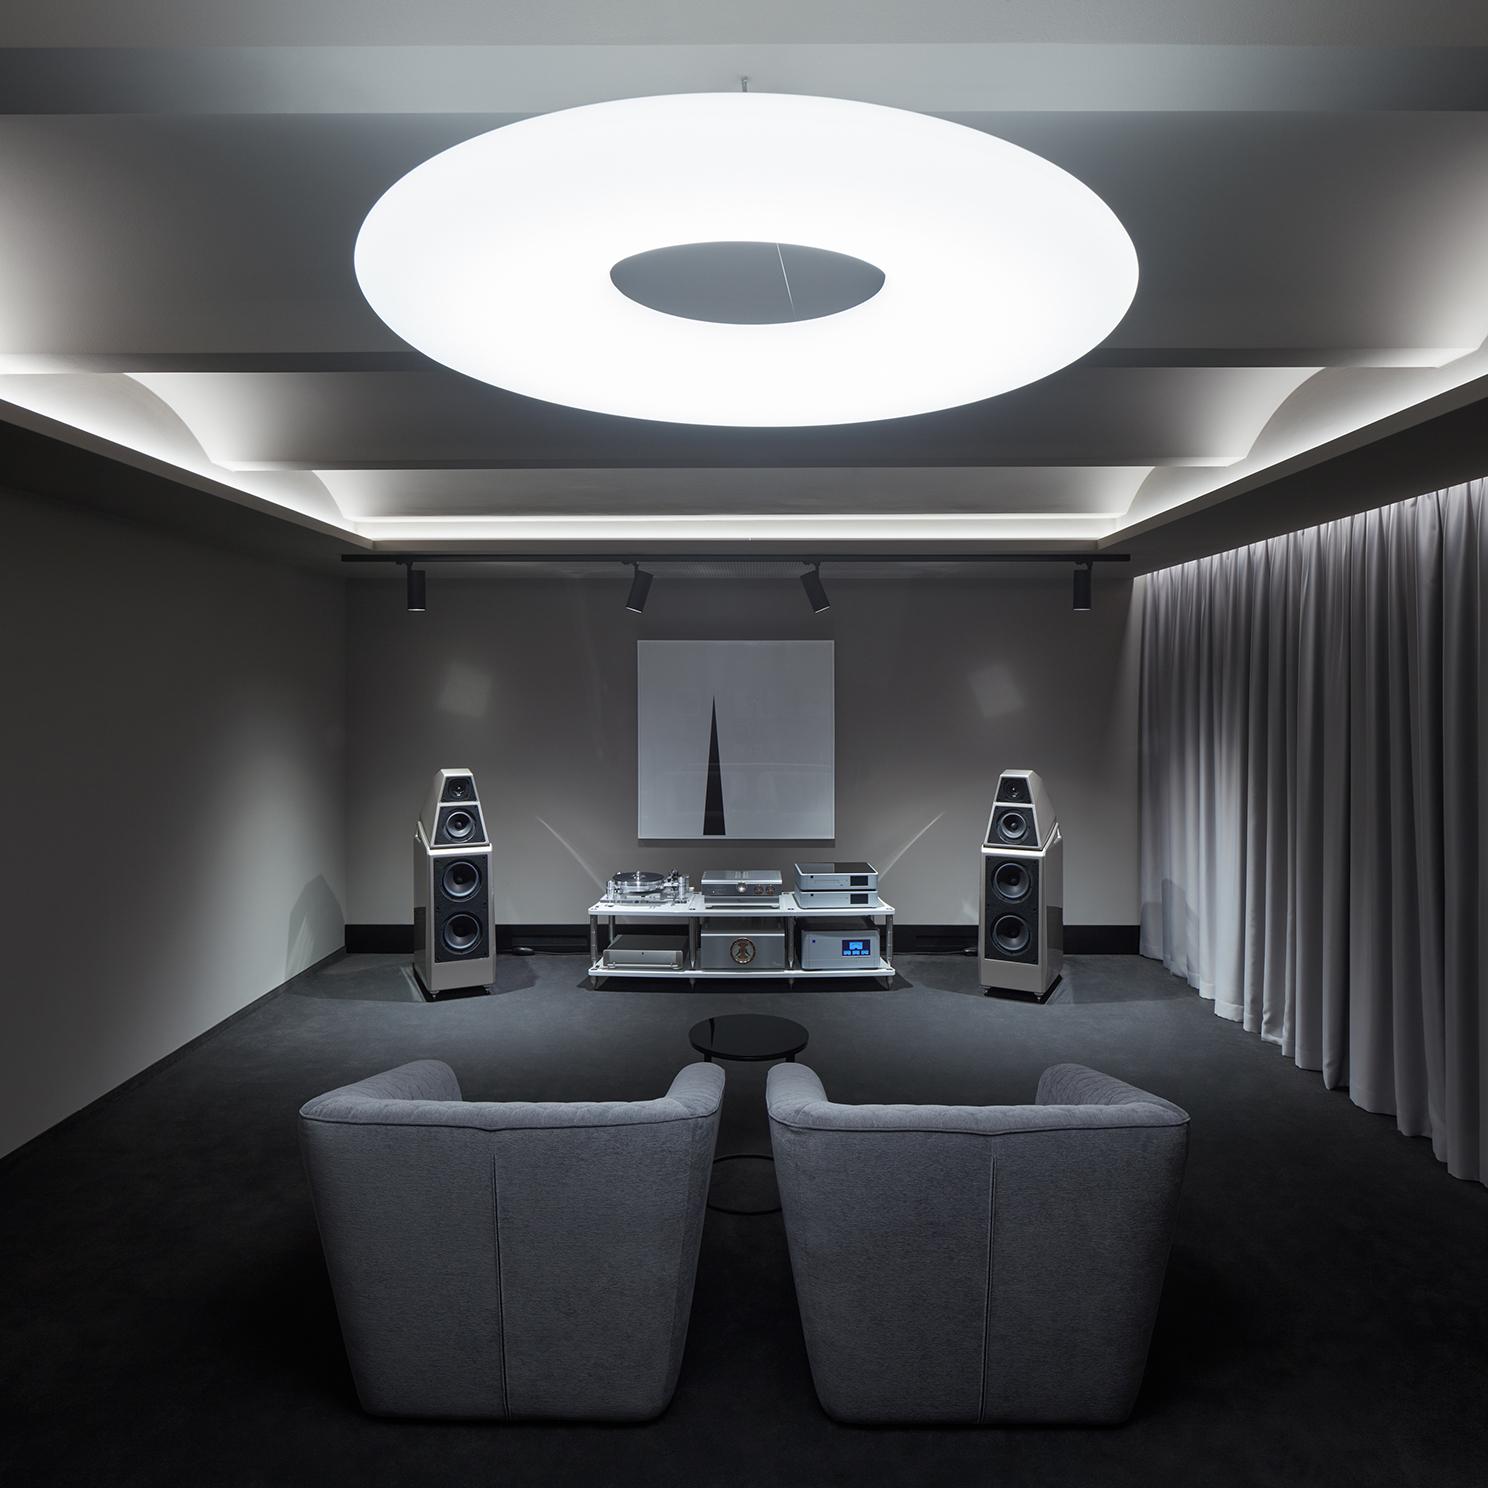 VOIX_BoysPlayNice_08_Barbora_Leblova_Interiors_Architecture